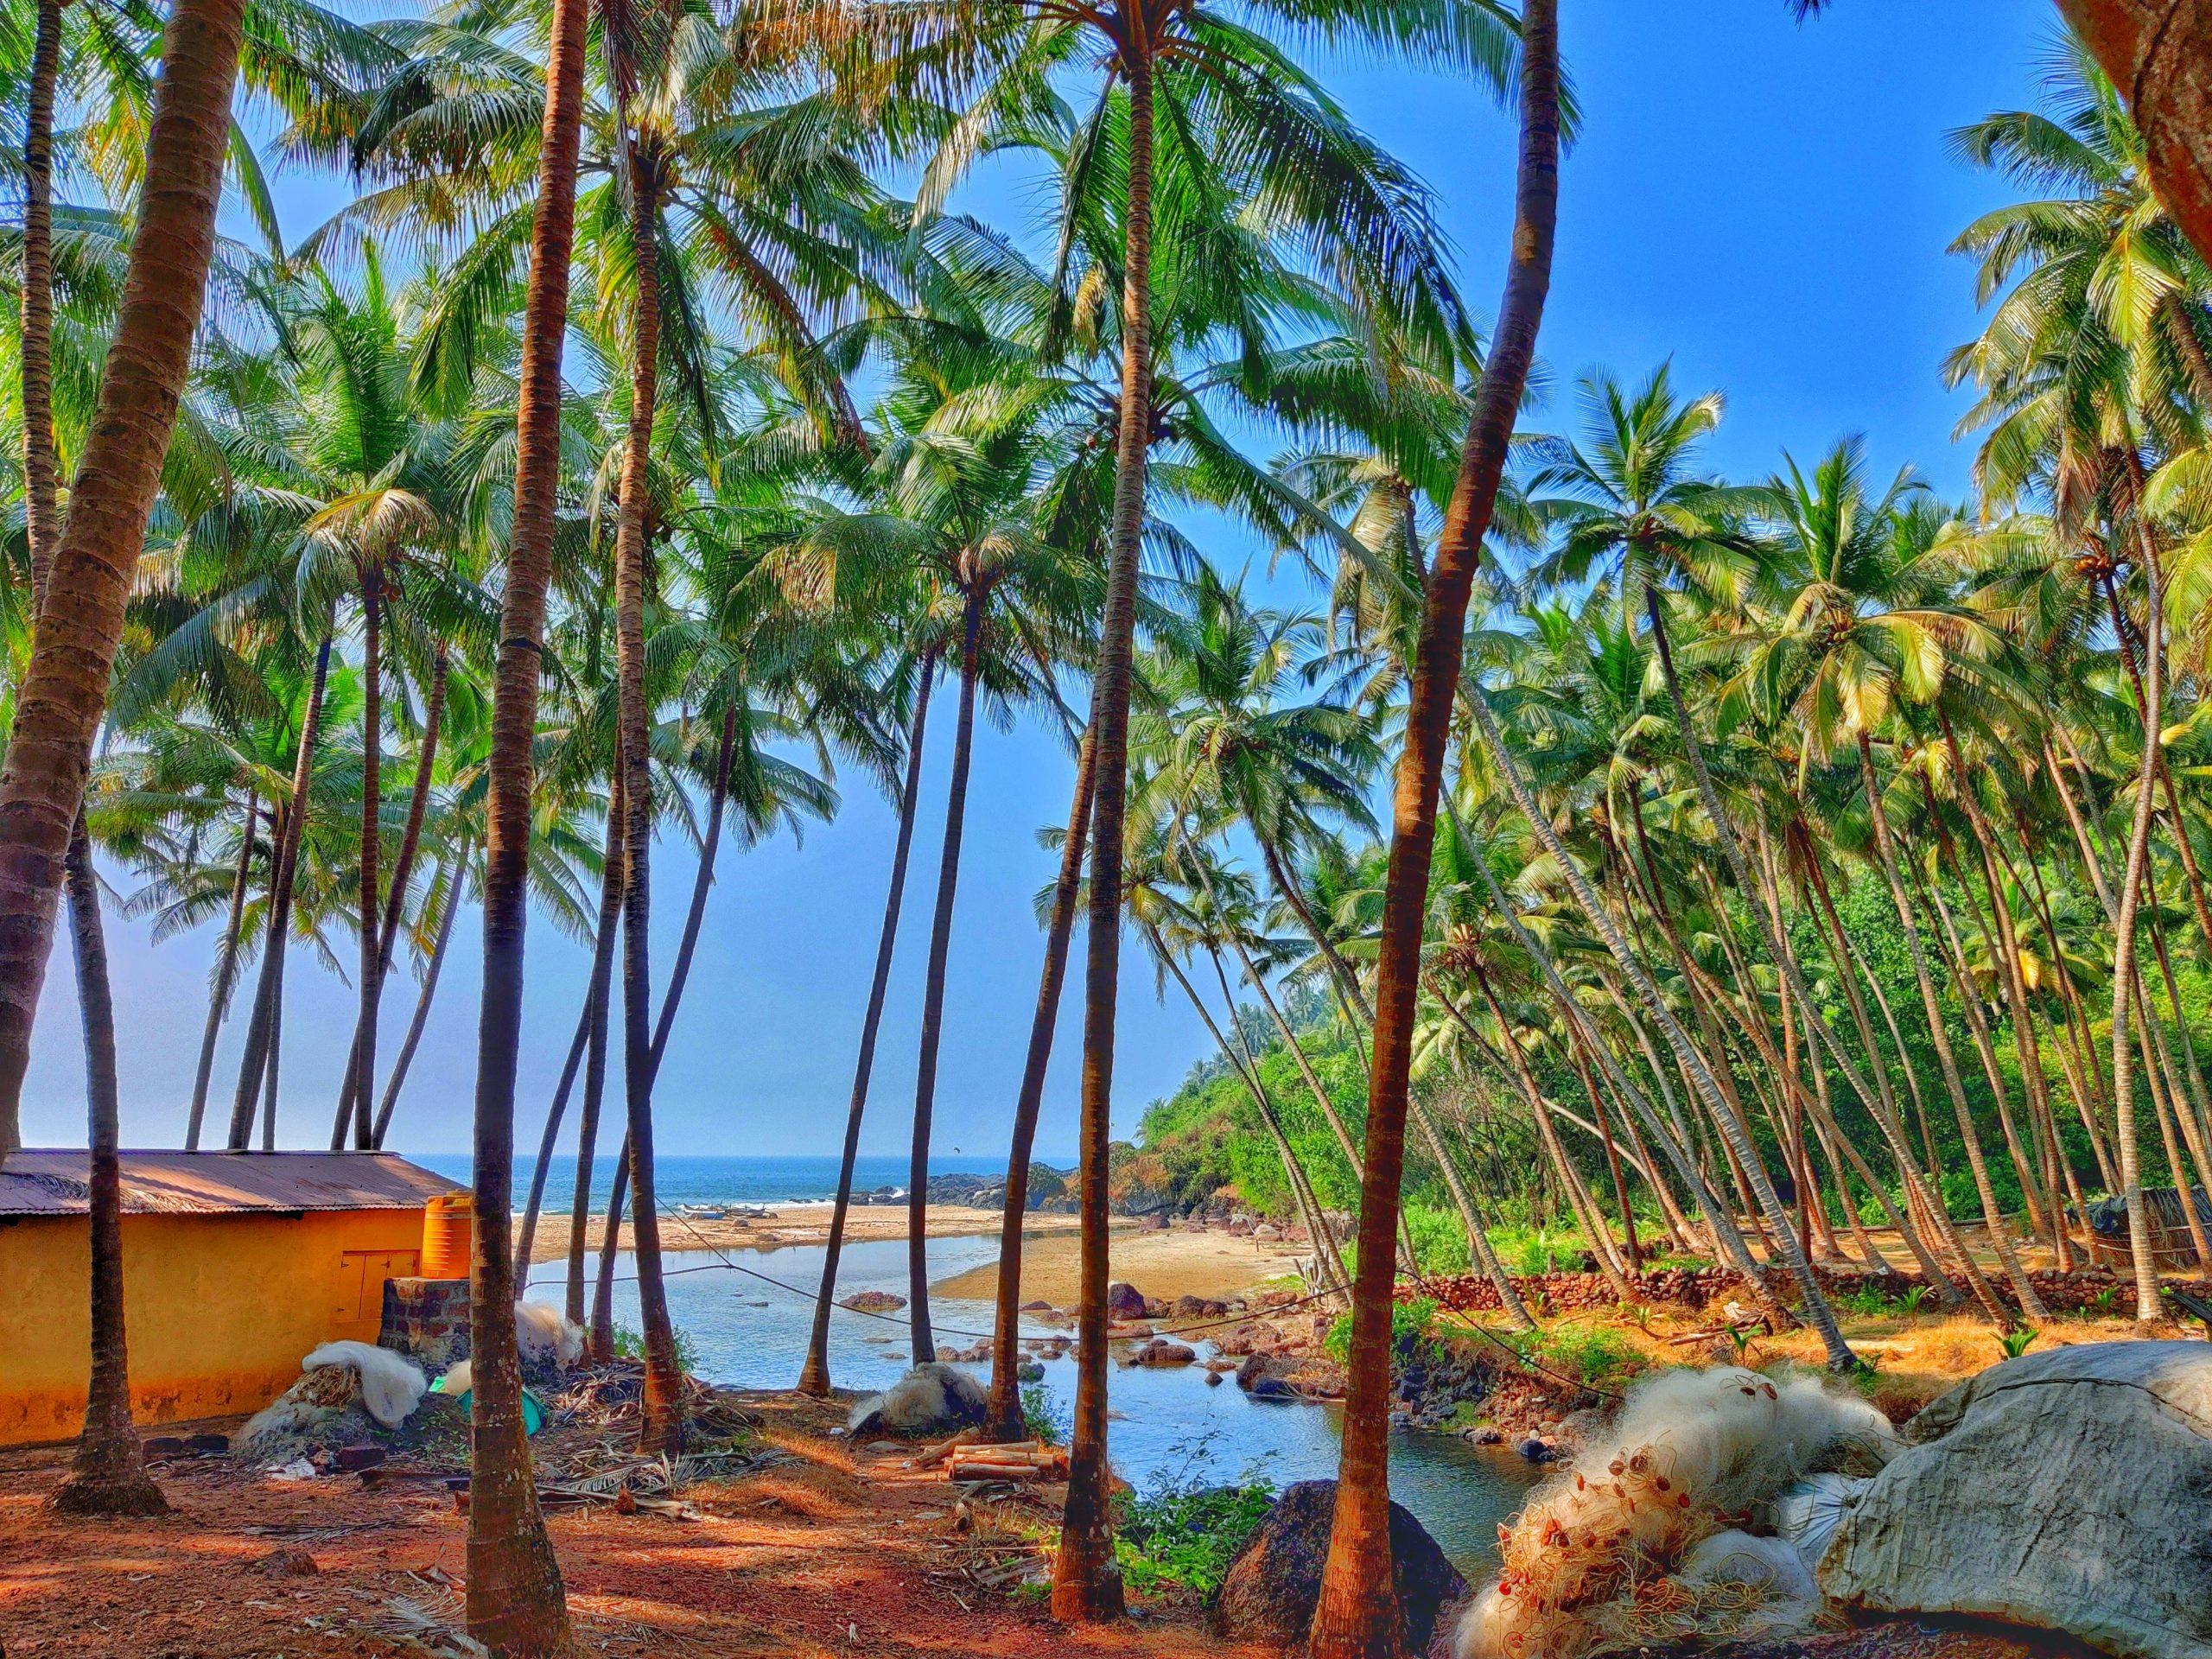 Palm tree at Vengurla beach